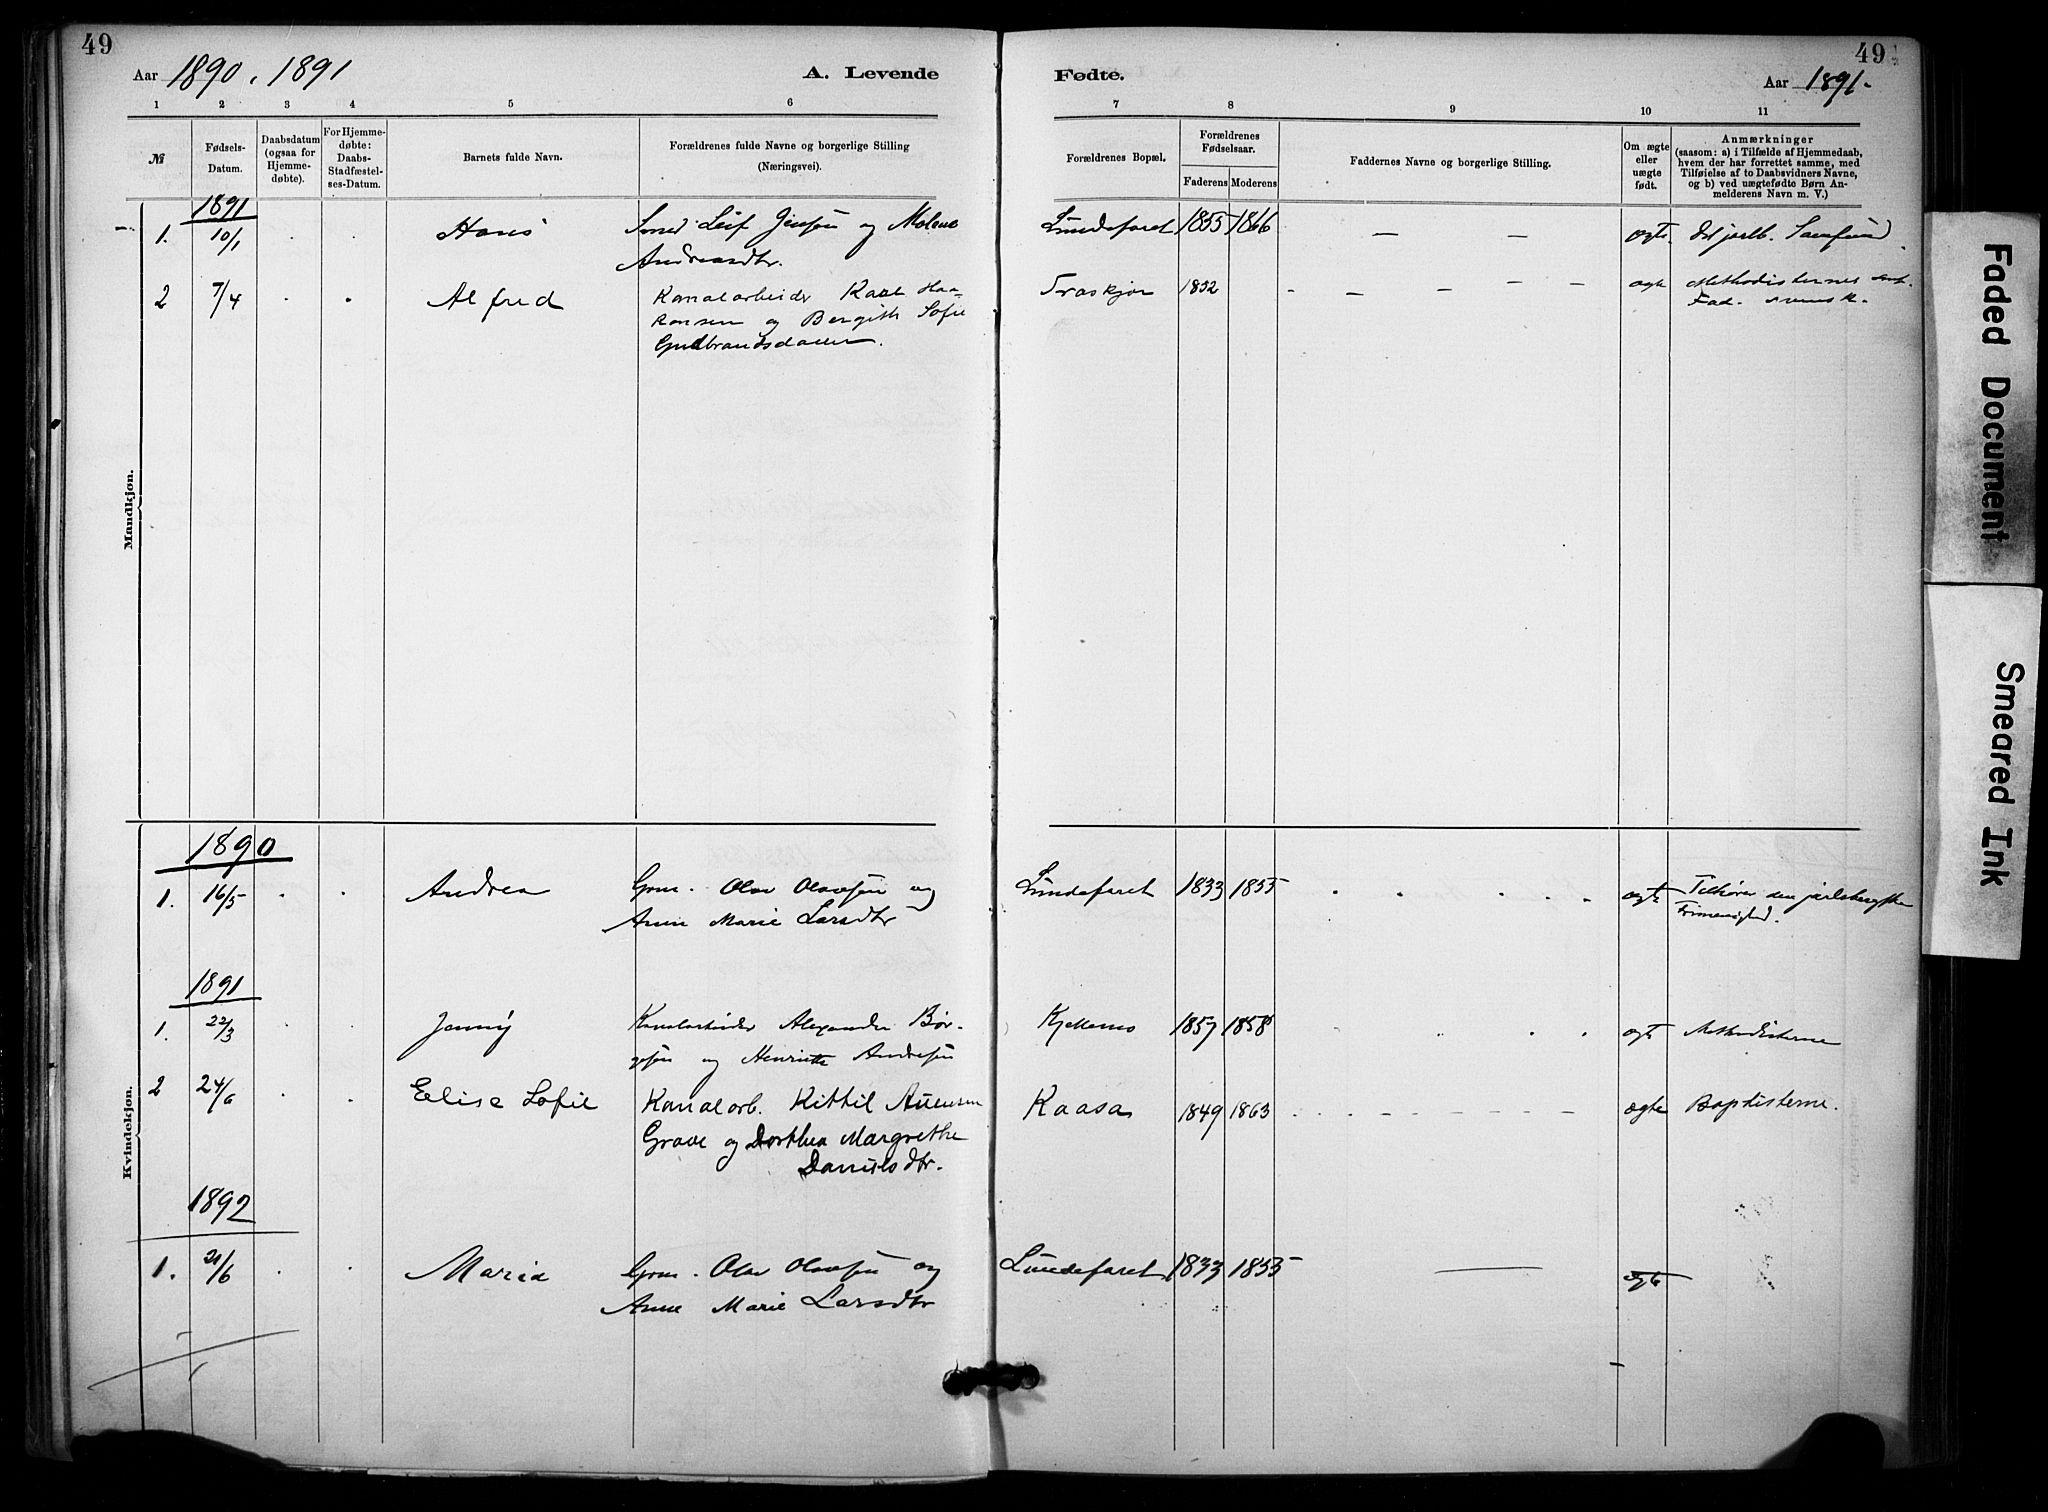 SAKO, Lunde kirkebøker, F/Fa/L0002: Ministerialbok nr. I 2, 1884-1892, s. 49